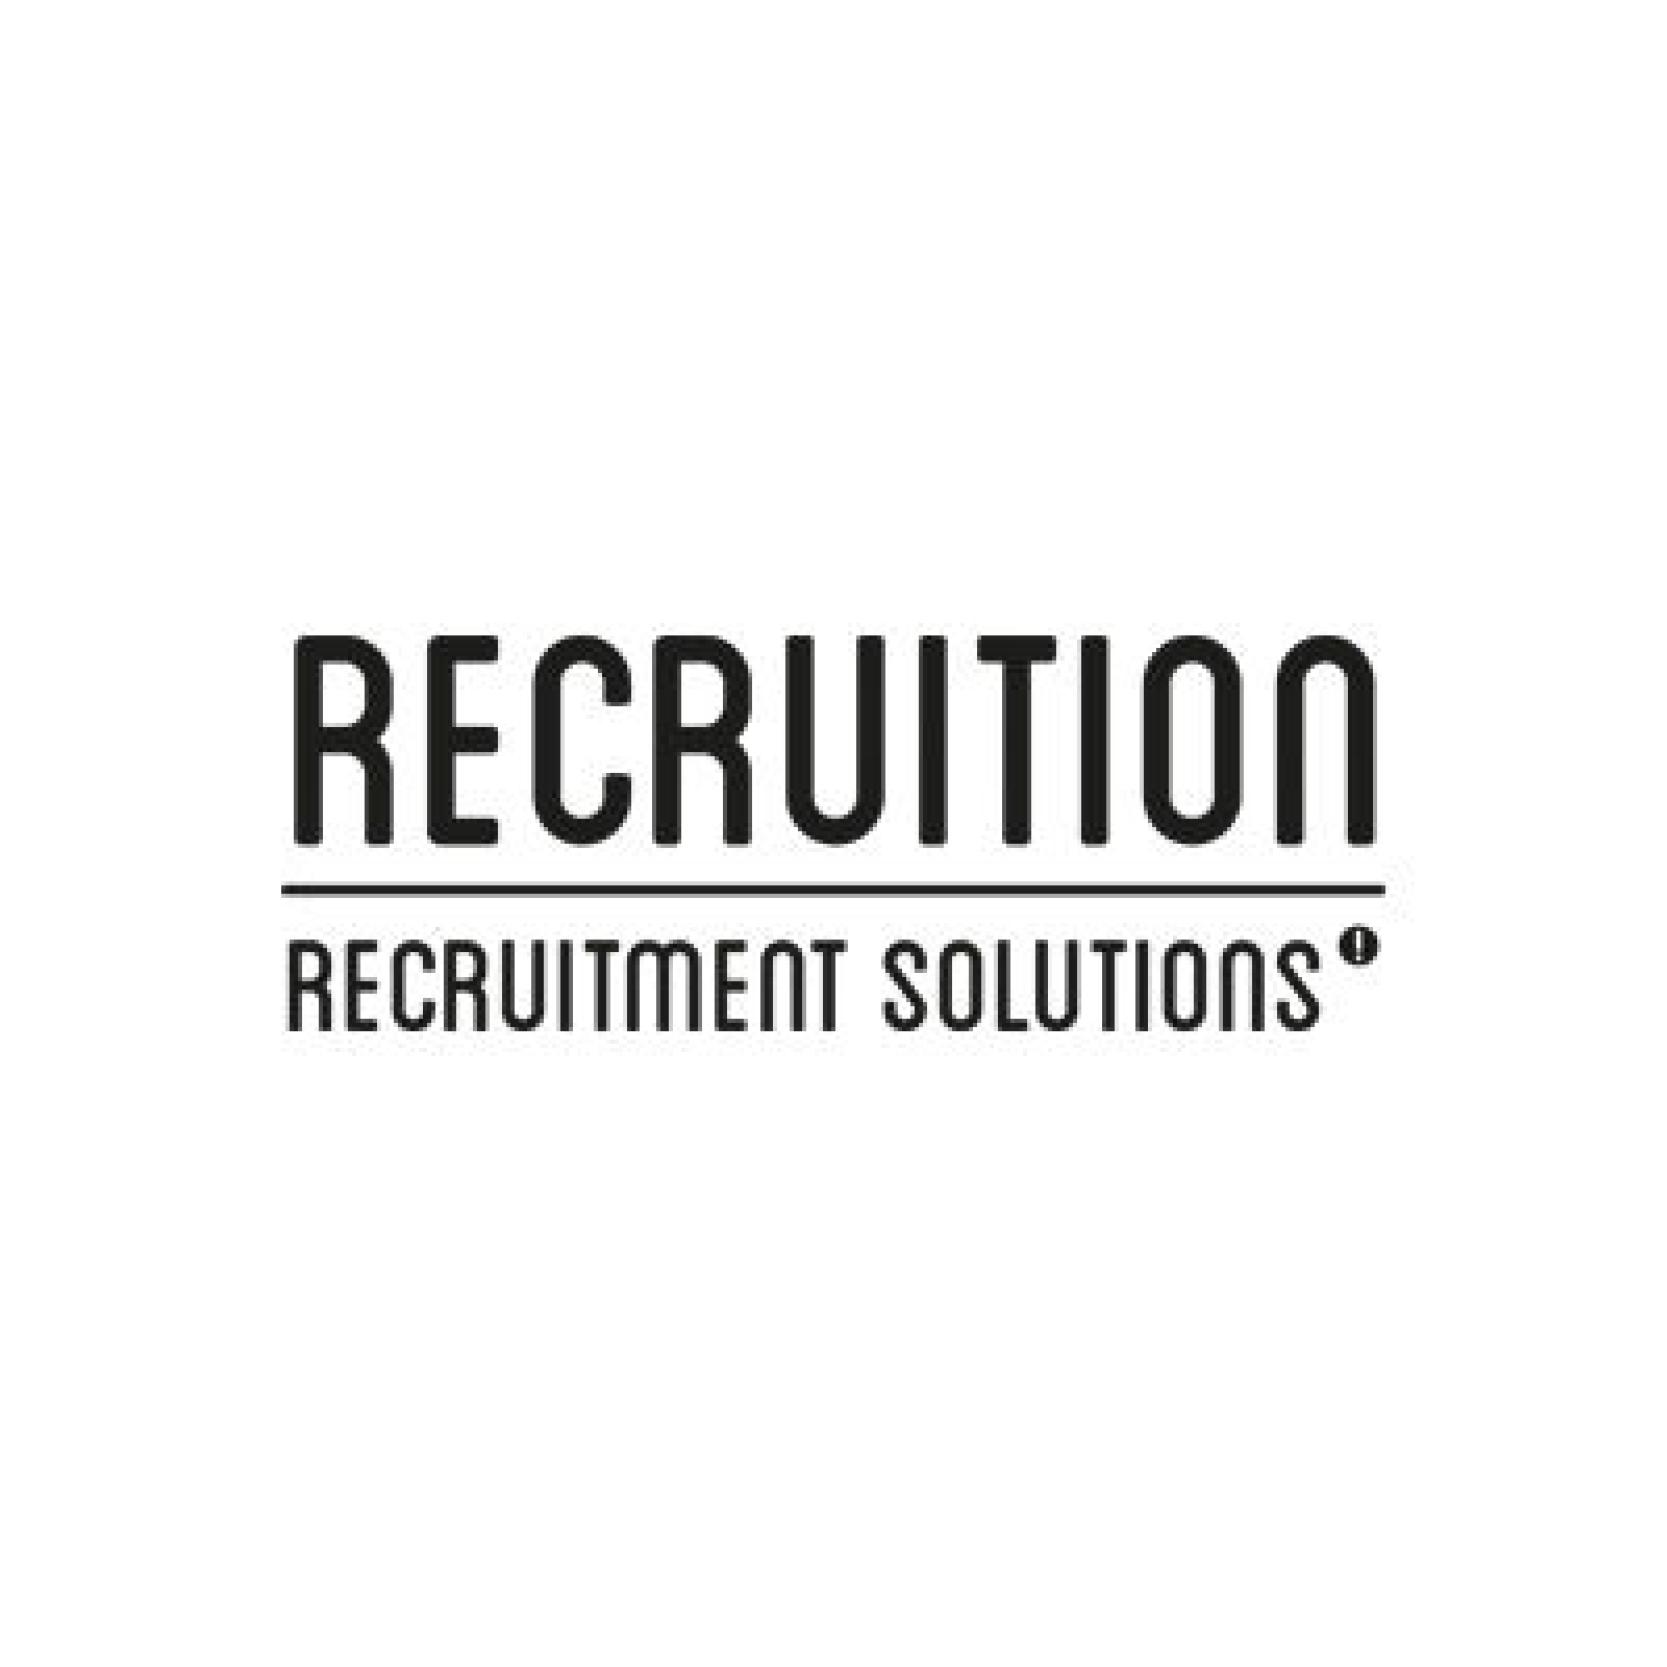 Recruition